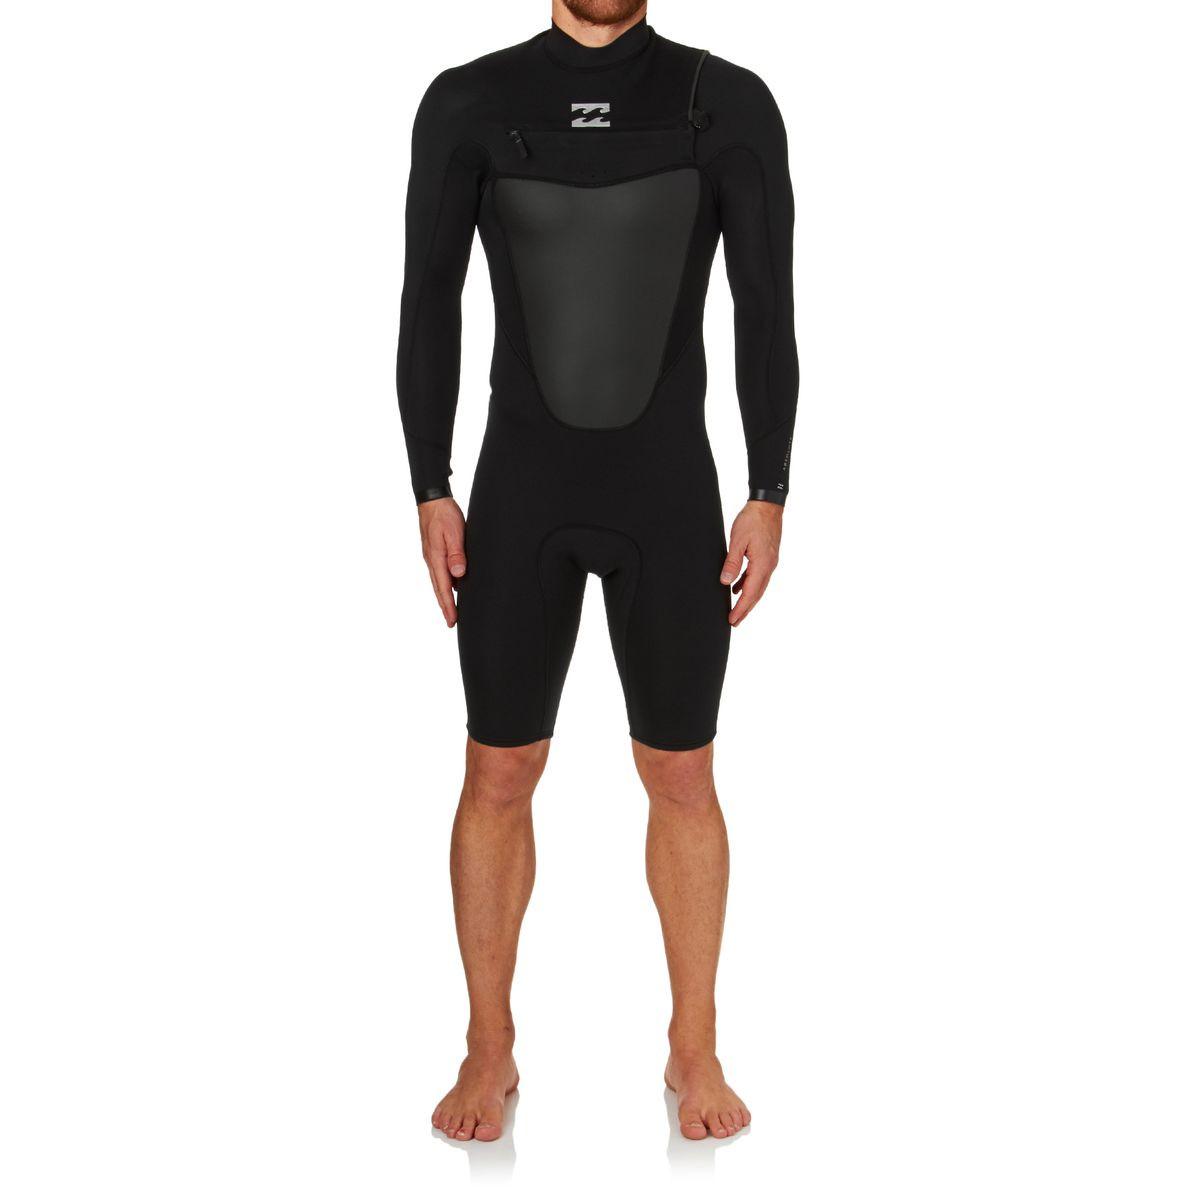 Billabong Absolute Comp 2mm 2017 Chest Zip Long Sleeve Shorty Wetsuit - Black